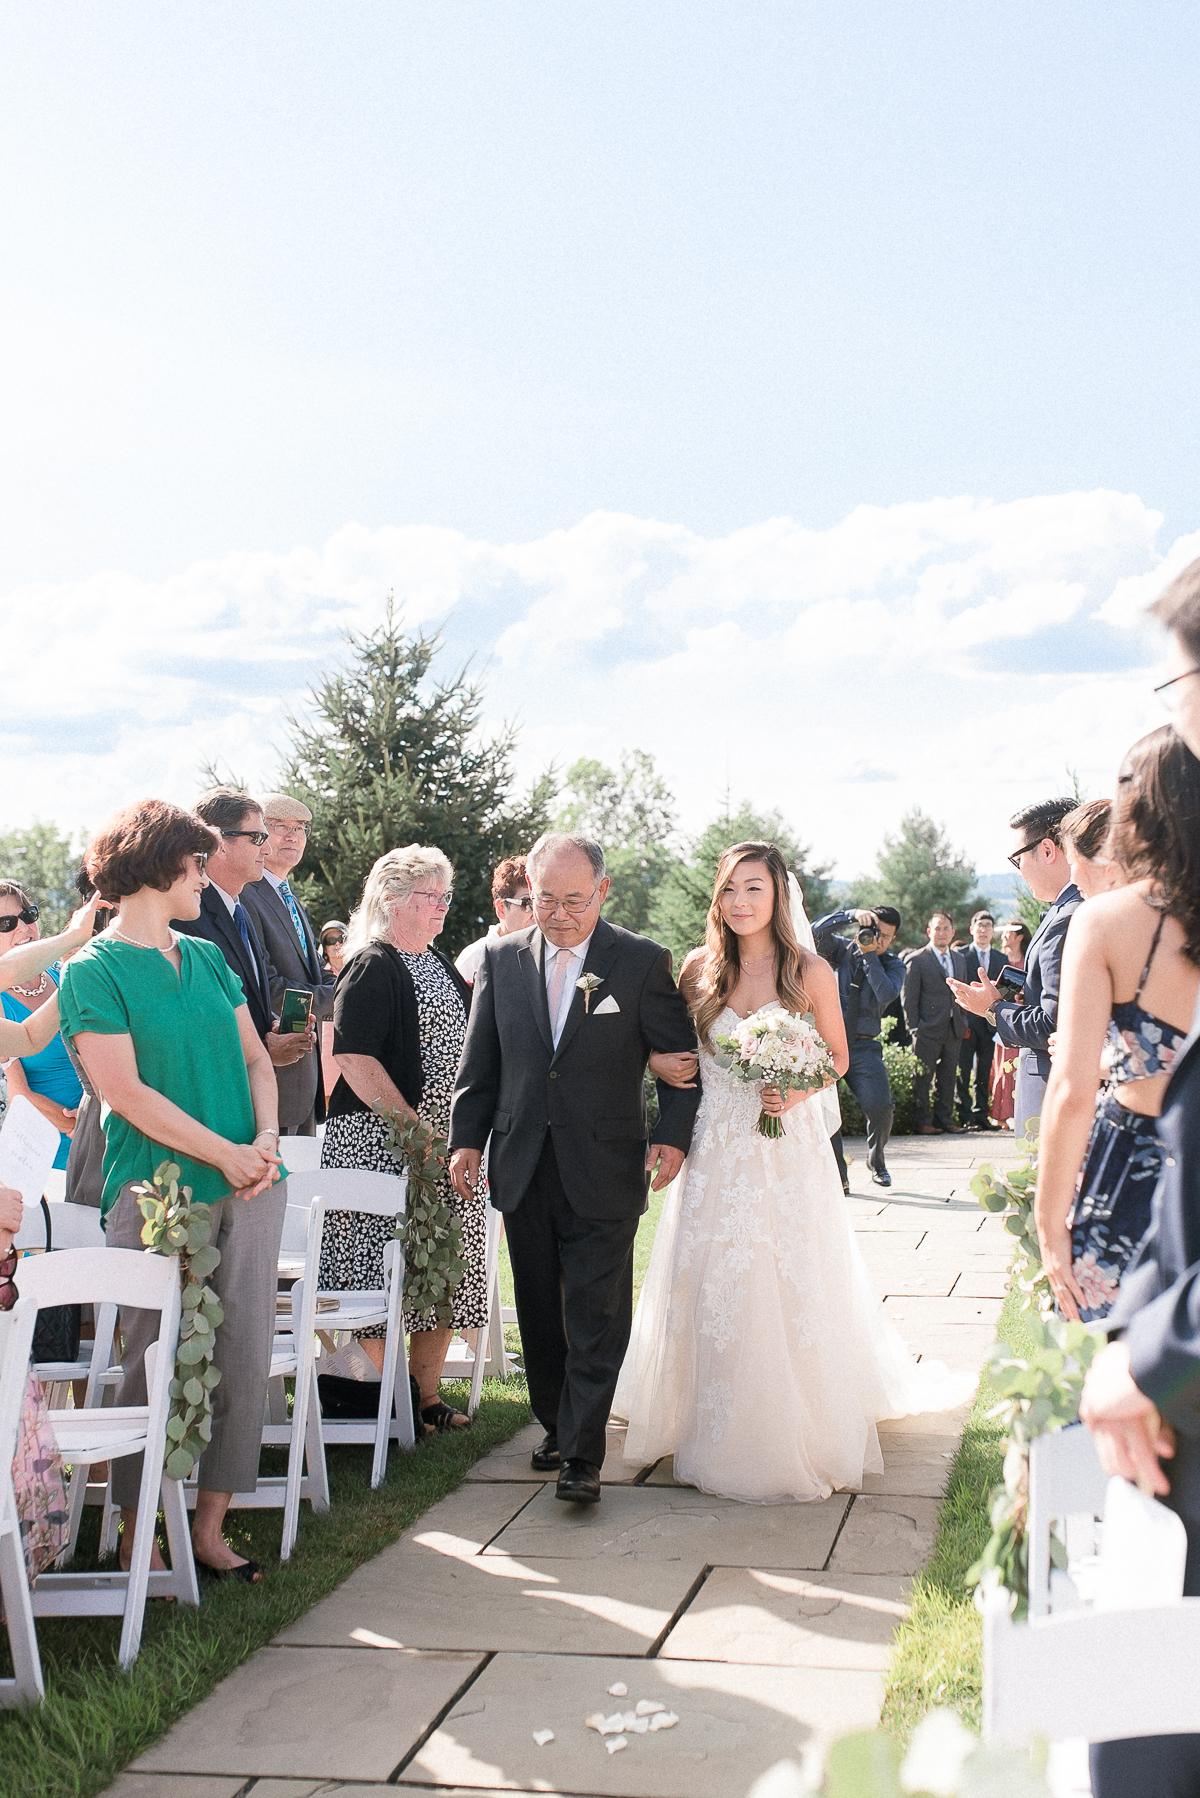 MD-Wedding-Musket-Ridge-Summer-Outdoor-Bride-Groom-5.jpg